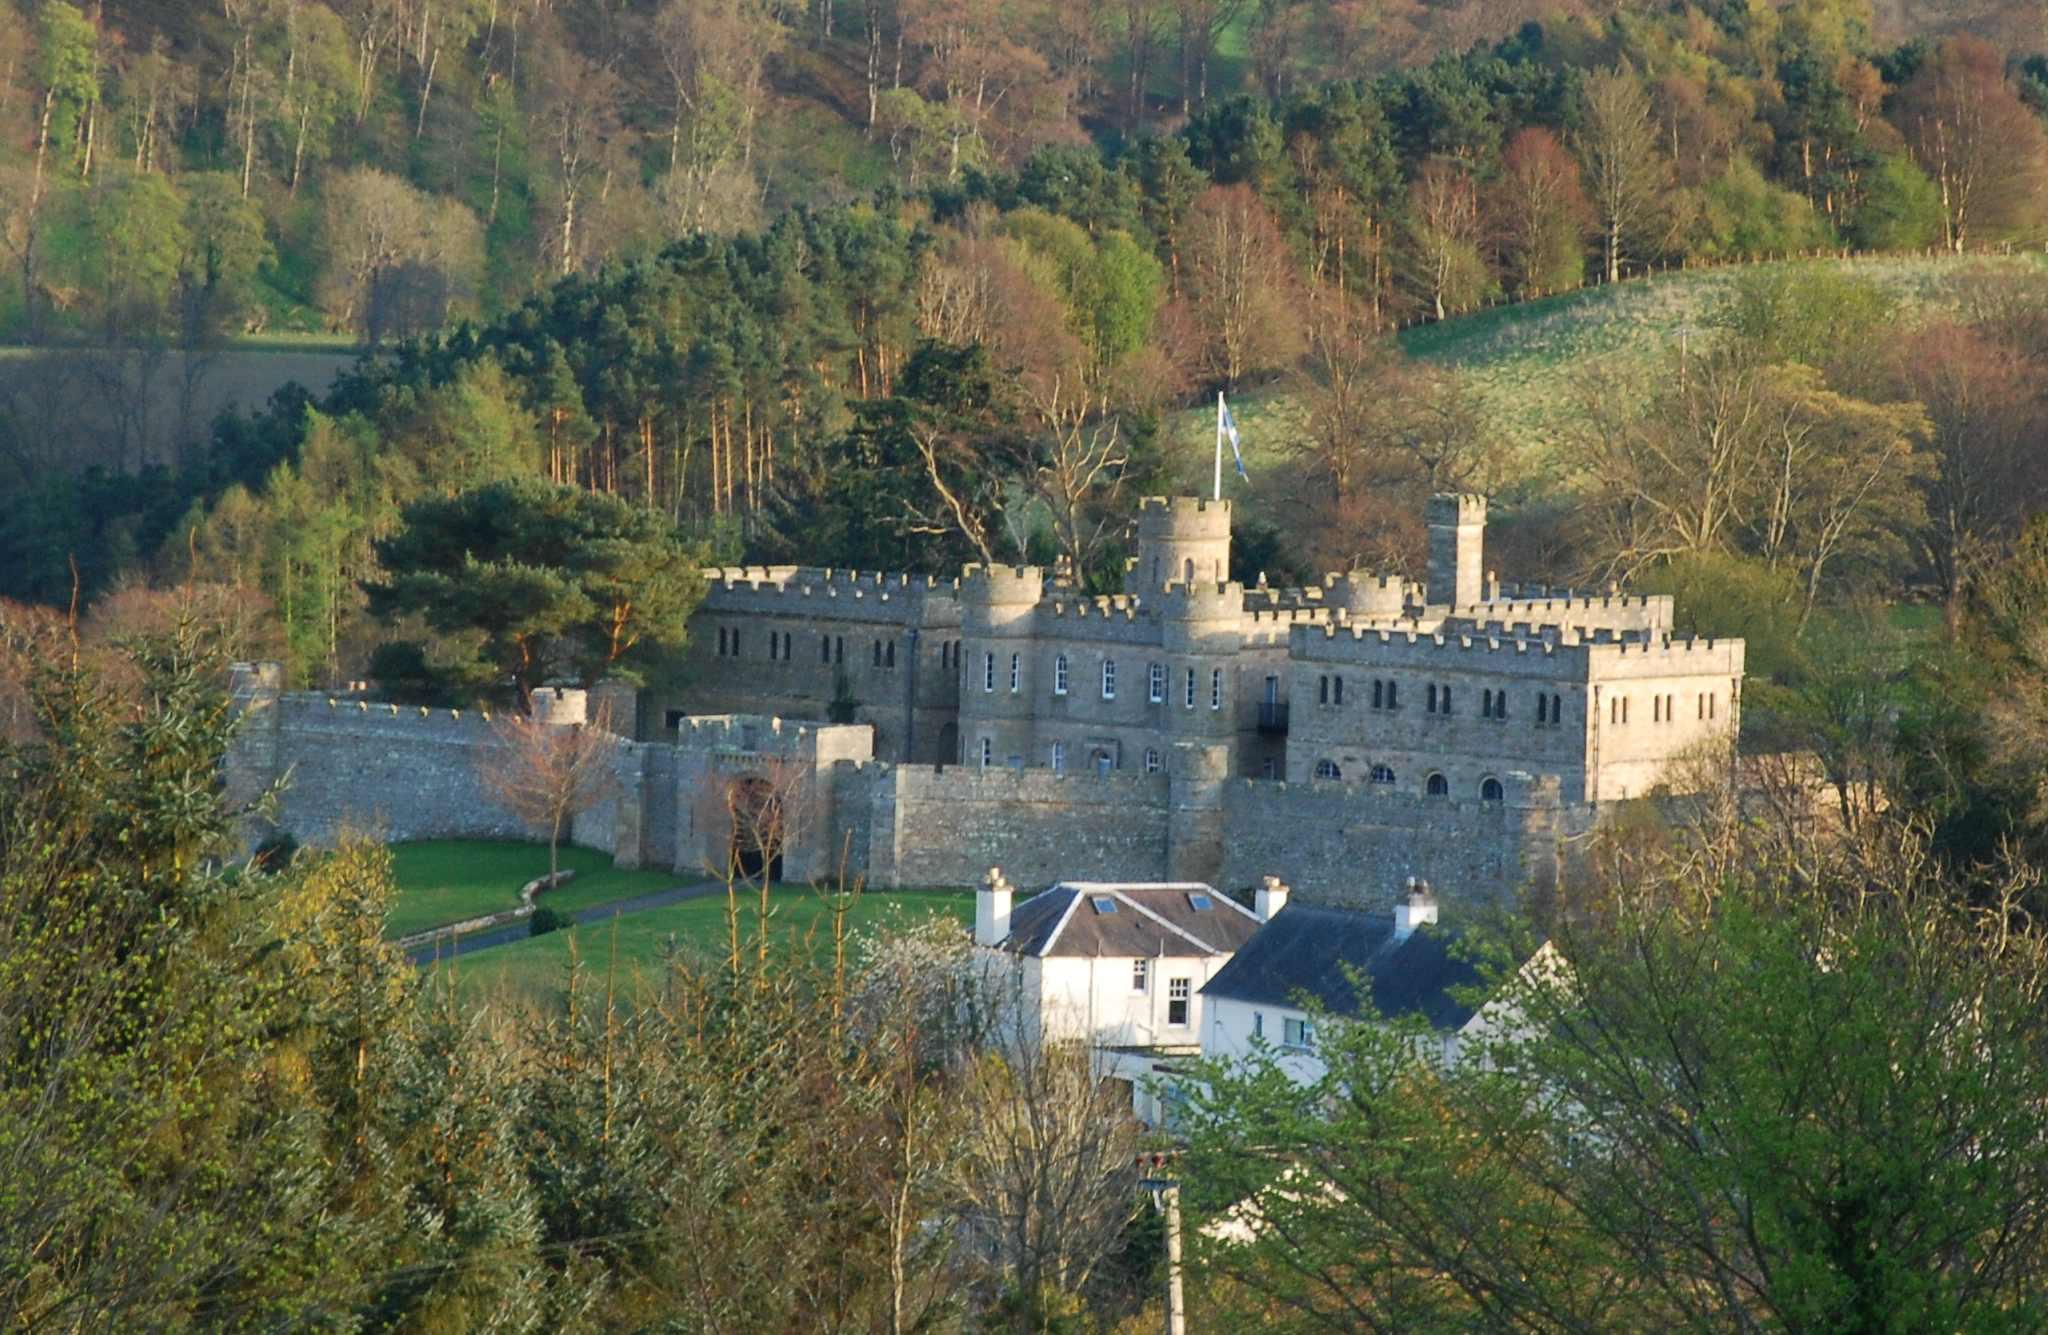 Jedburgh Castle Jail Jedburgh Castle Jail Locations